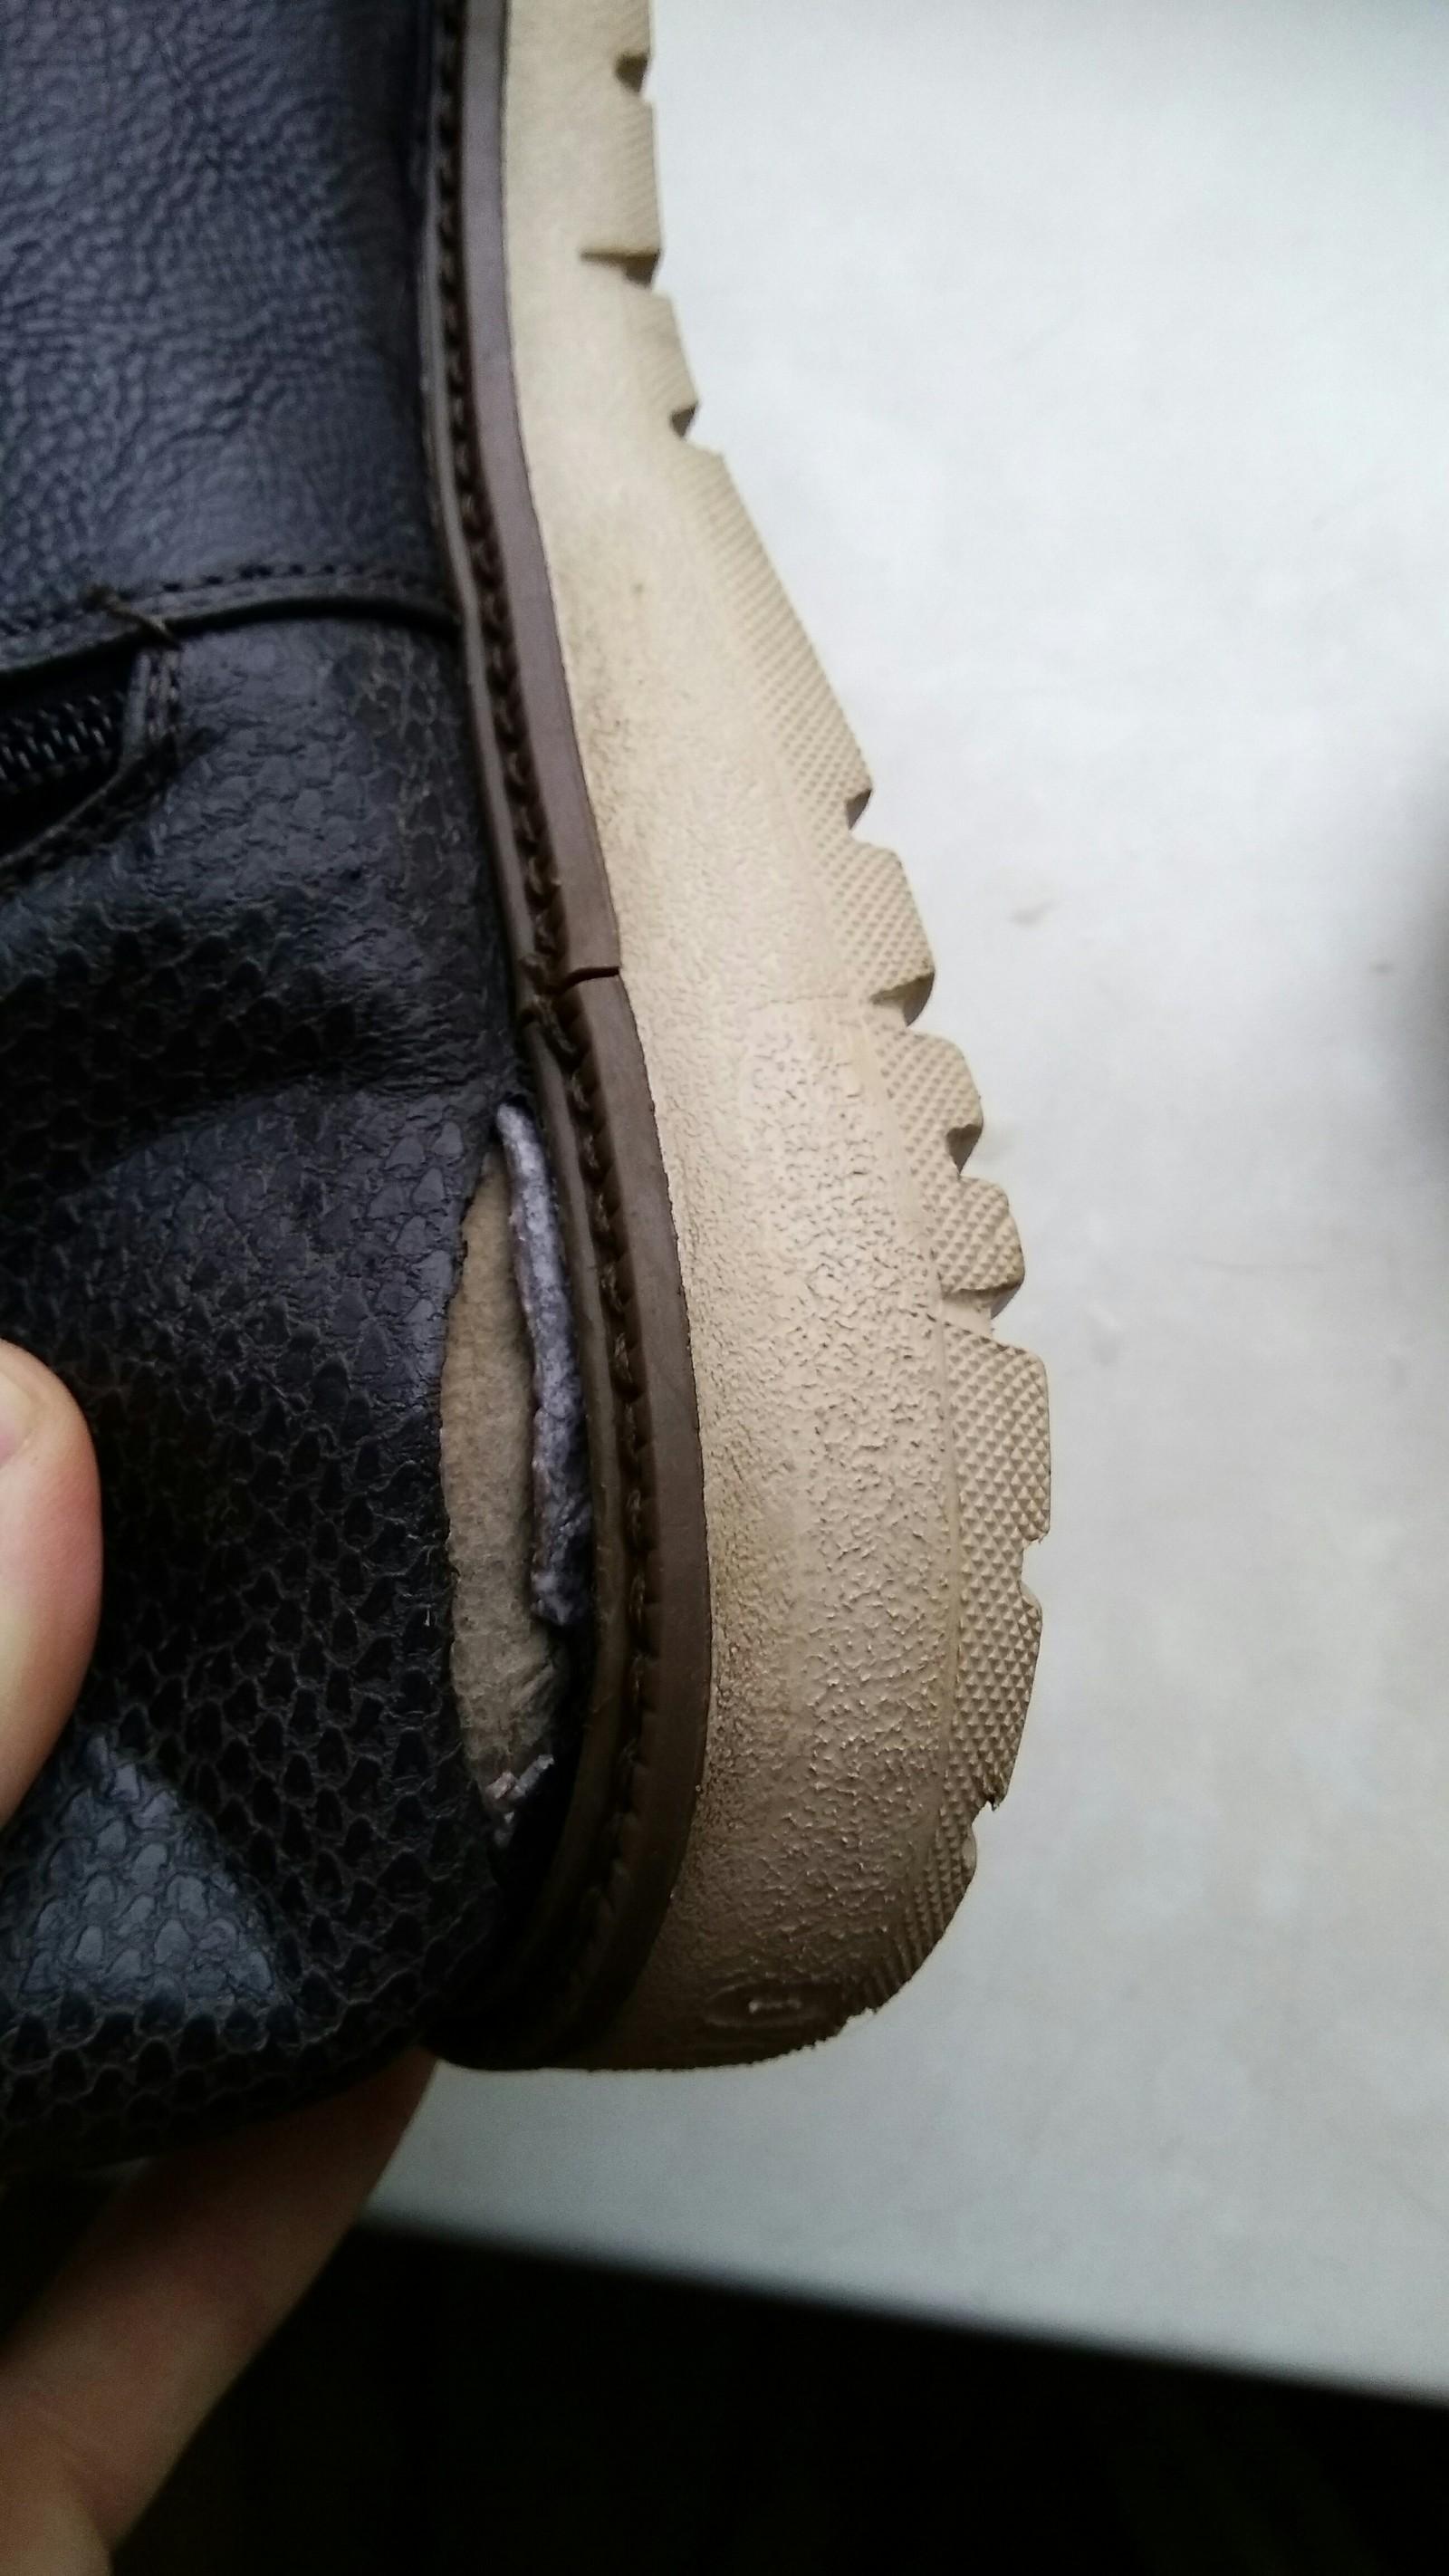 9e73803c6 Вот такой обувью торгует Lamoda